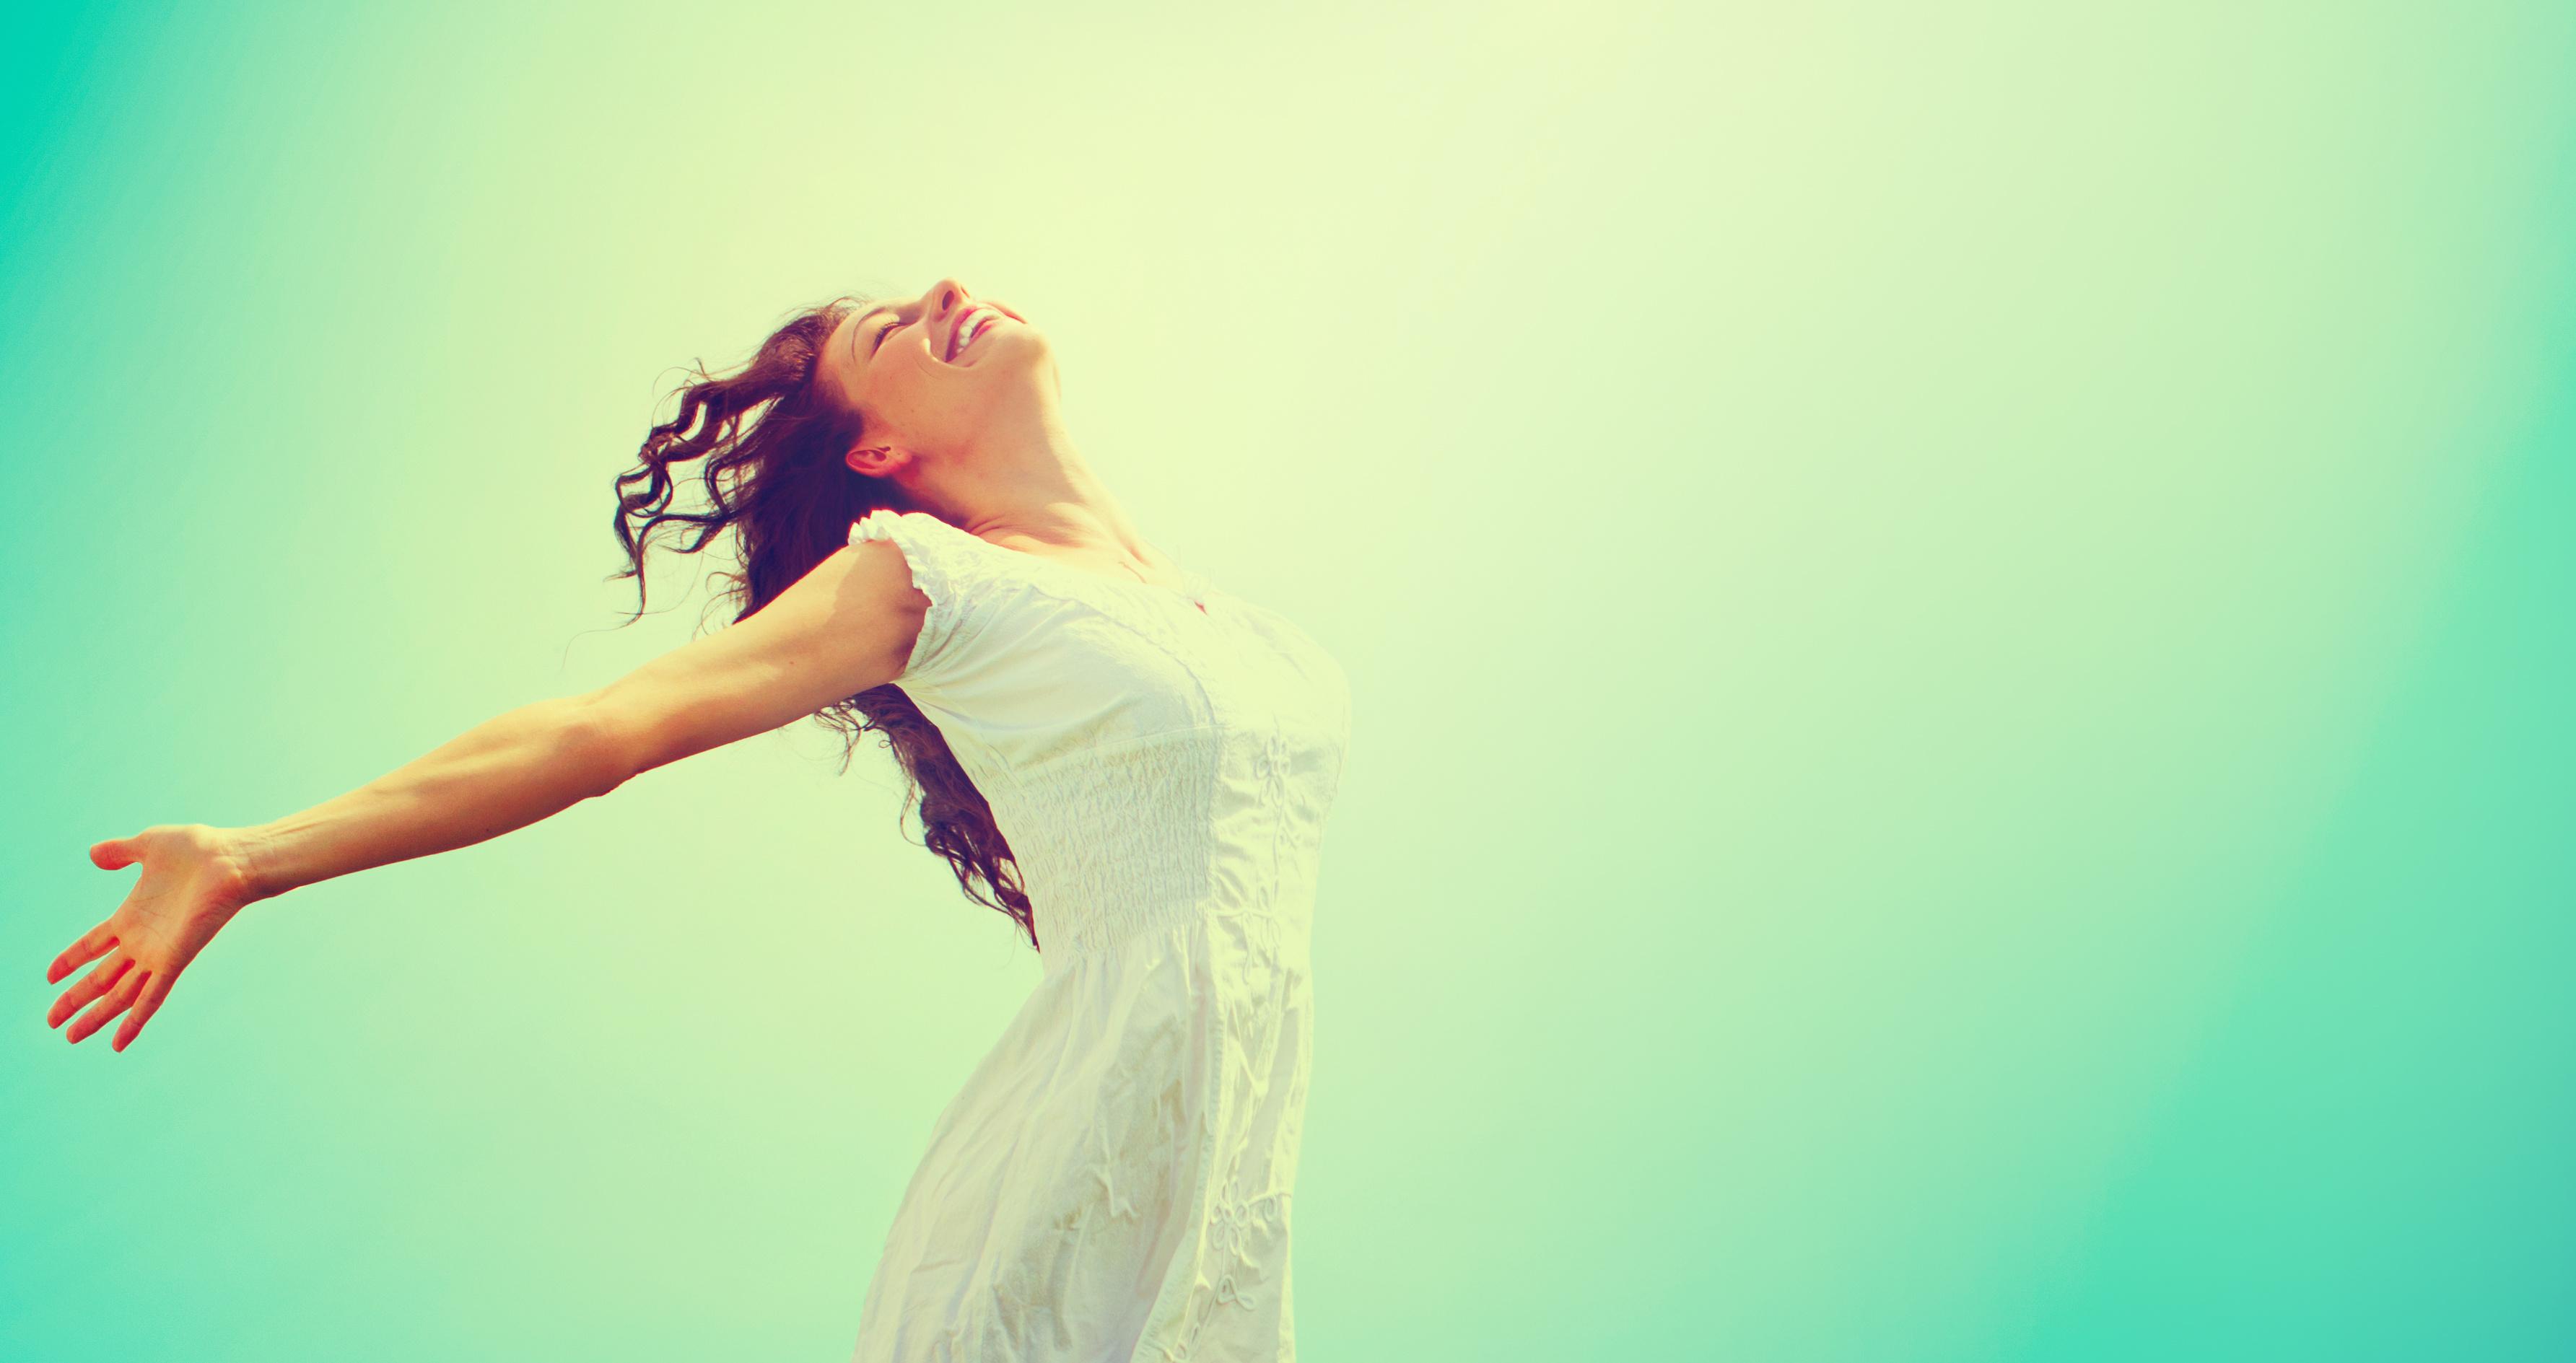 The Hormone Diva Free Happy Woman Enjoying Nature